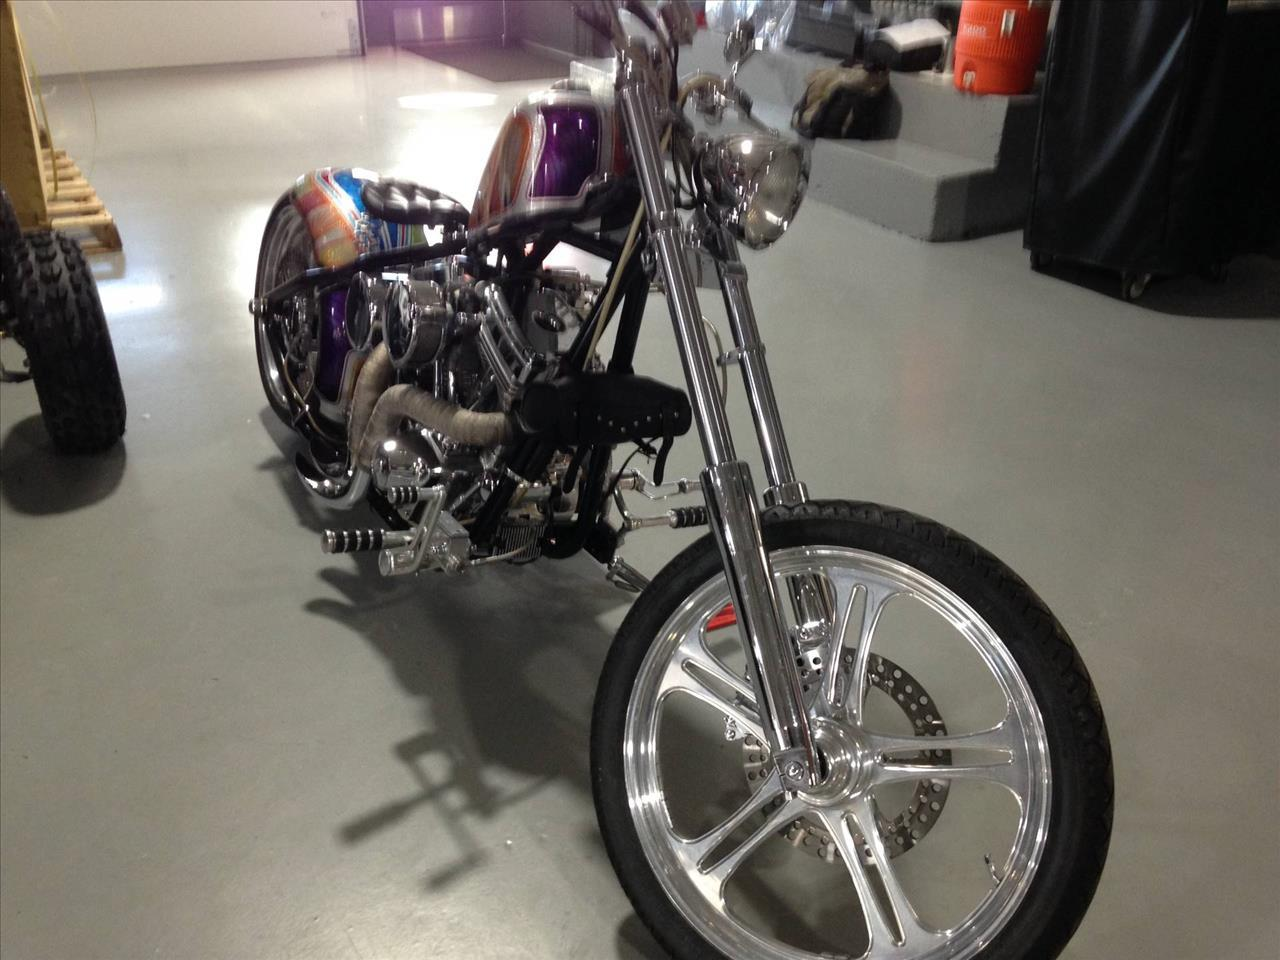 2008 SPCN CUSTOM MOTORCYCLE for sale at Vehicle Network, LLC - Performance East, INC. in Goldsboro NC